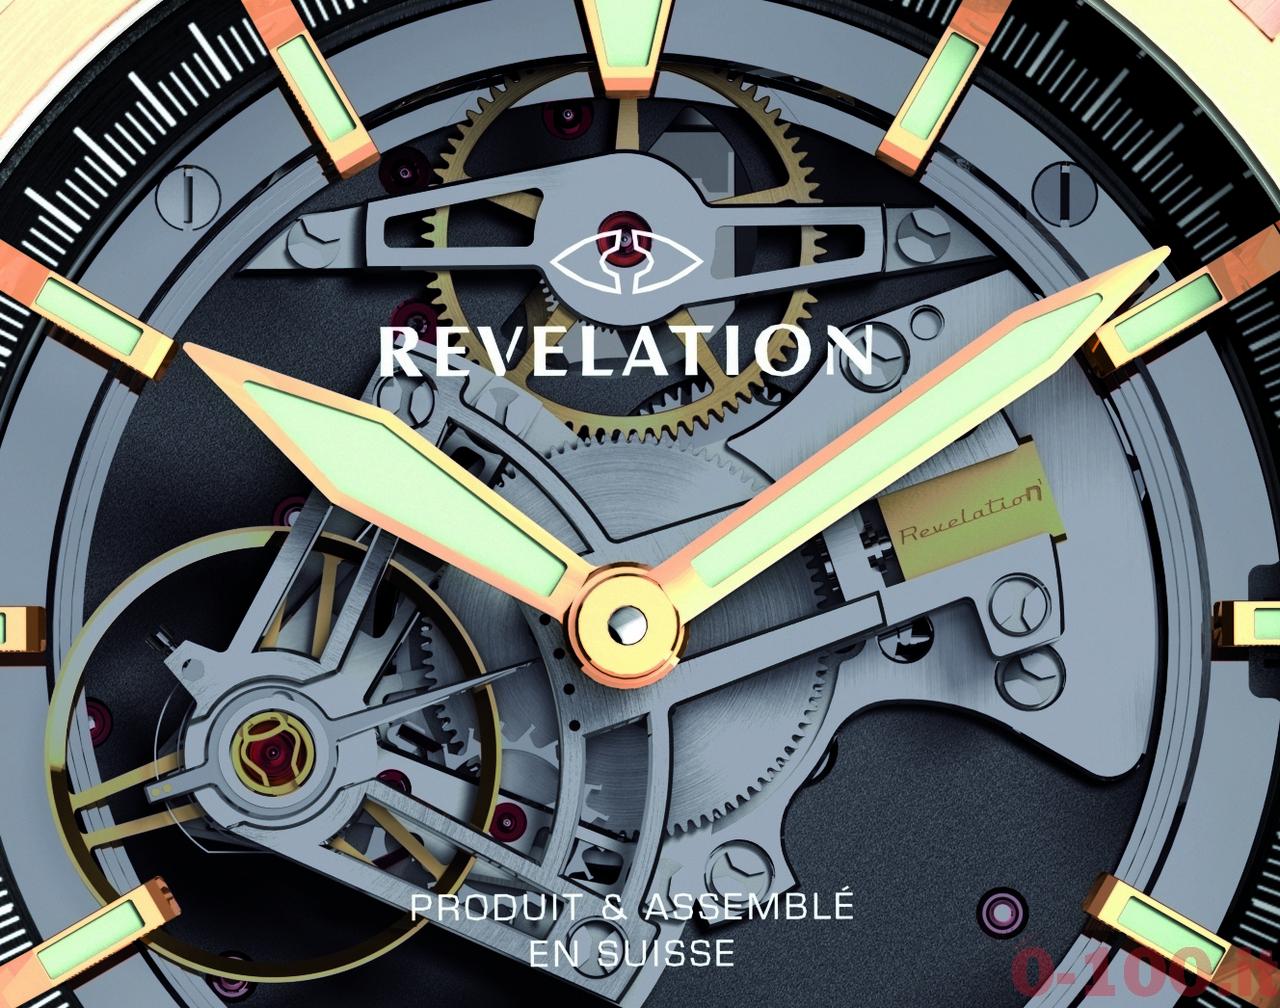 anteprima-baselworld-2014-revelation-r04-tourbillon-magical-watch-dial_0-1006